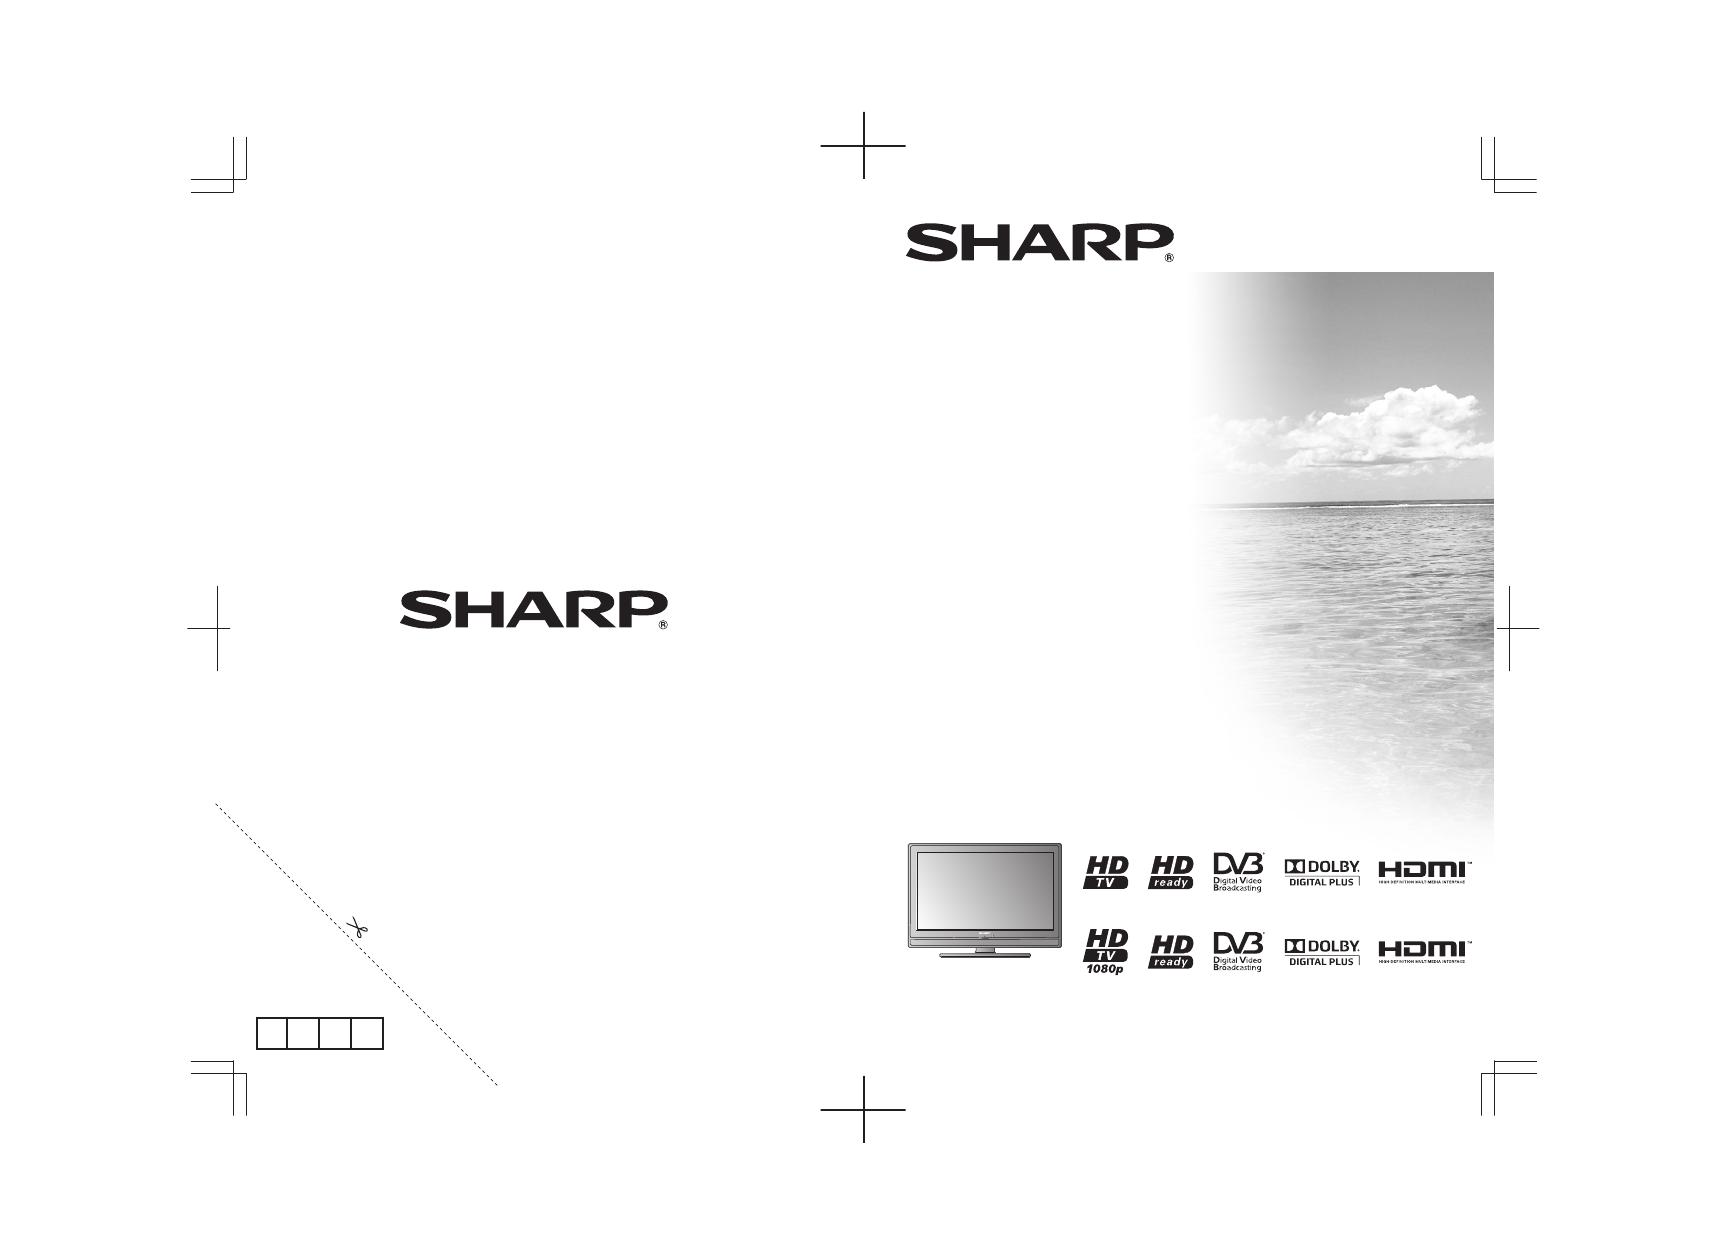 Инструкция по эксплуатации телевизор sharp